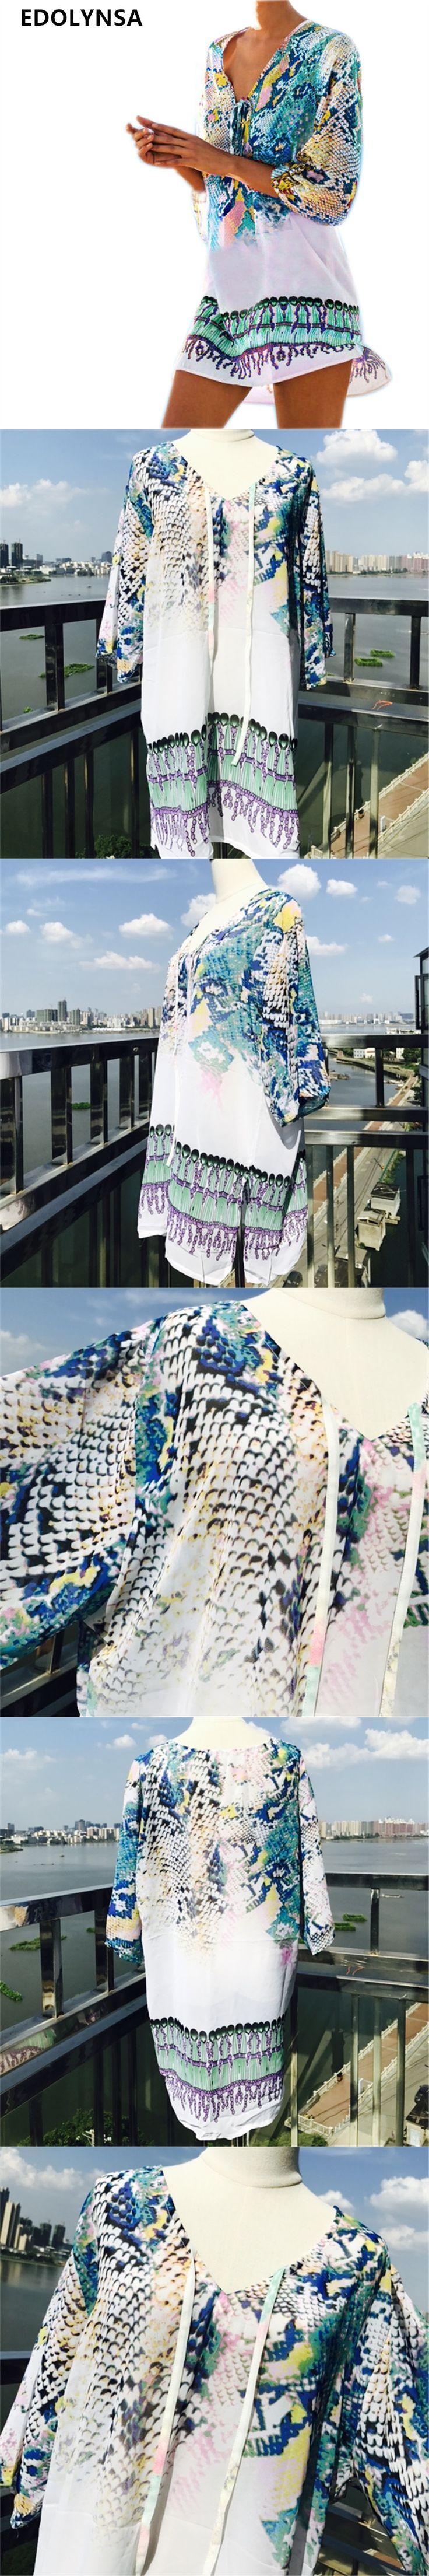 Bathing Suit Beach Caftan Swimsuit Cover up Print Chiffon Pareo Women Robe Plage Swimwear Dress Sexy Sarong Beach Tunic #Q152